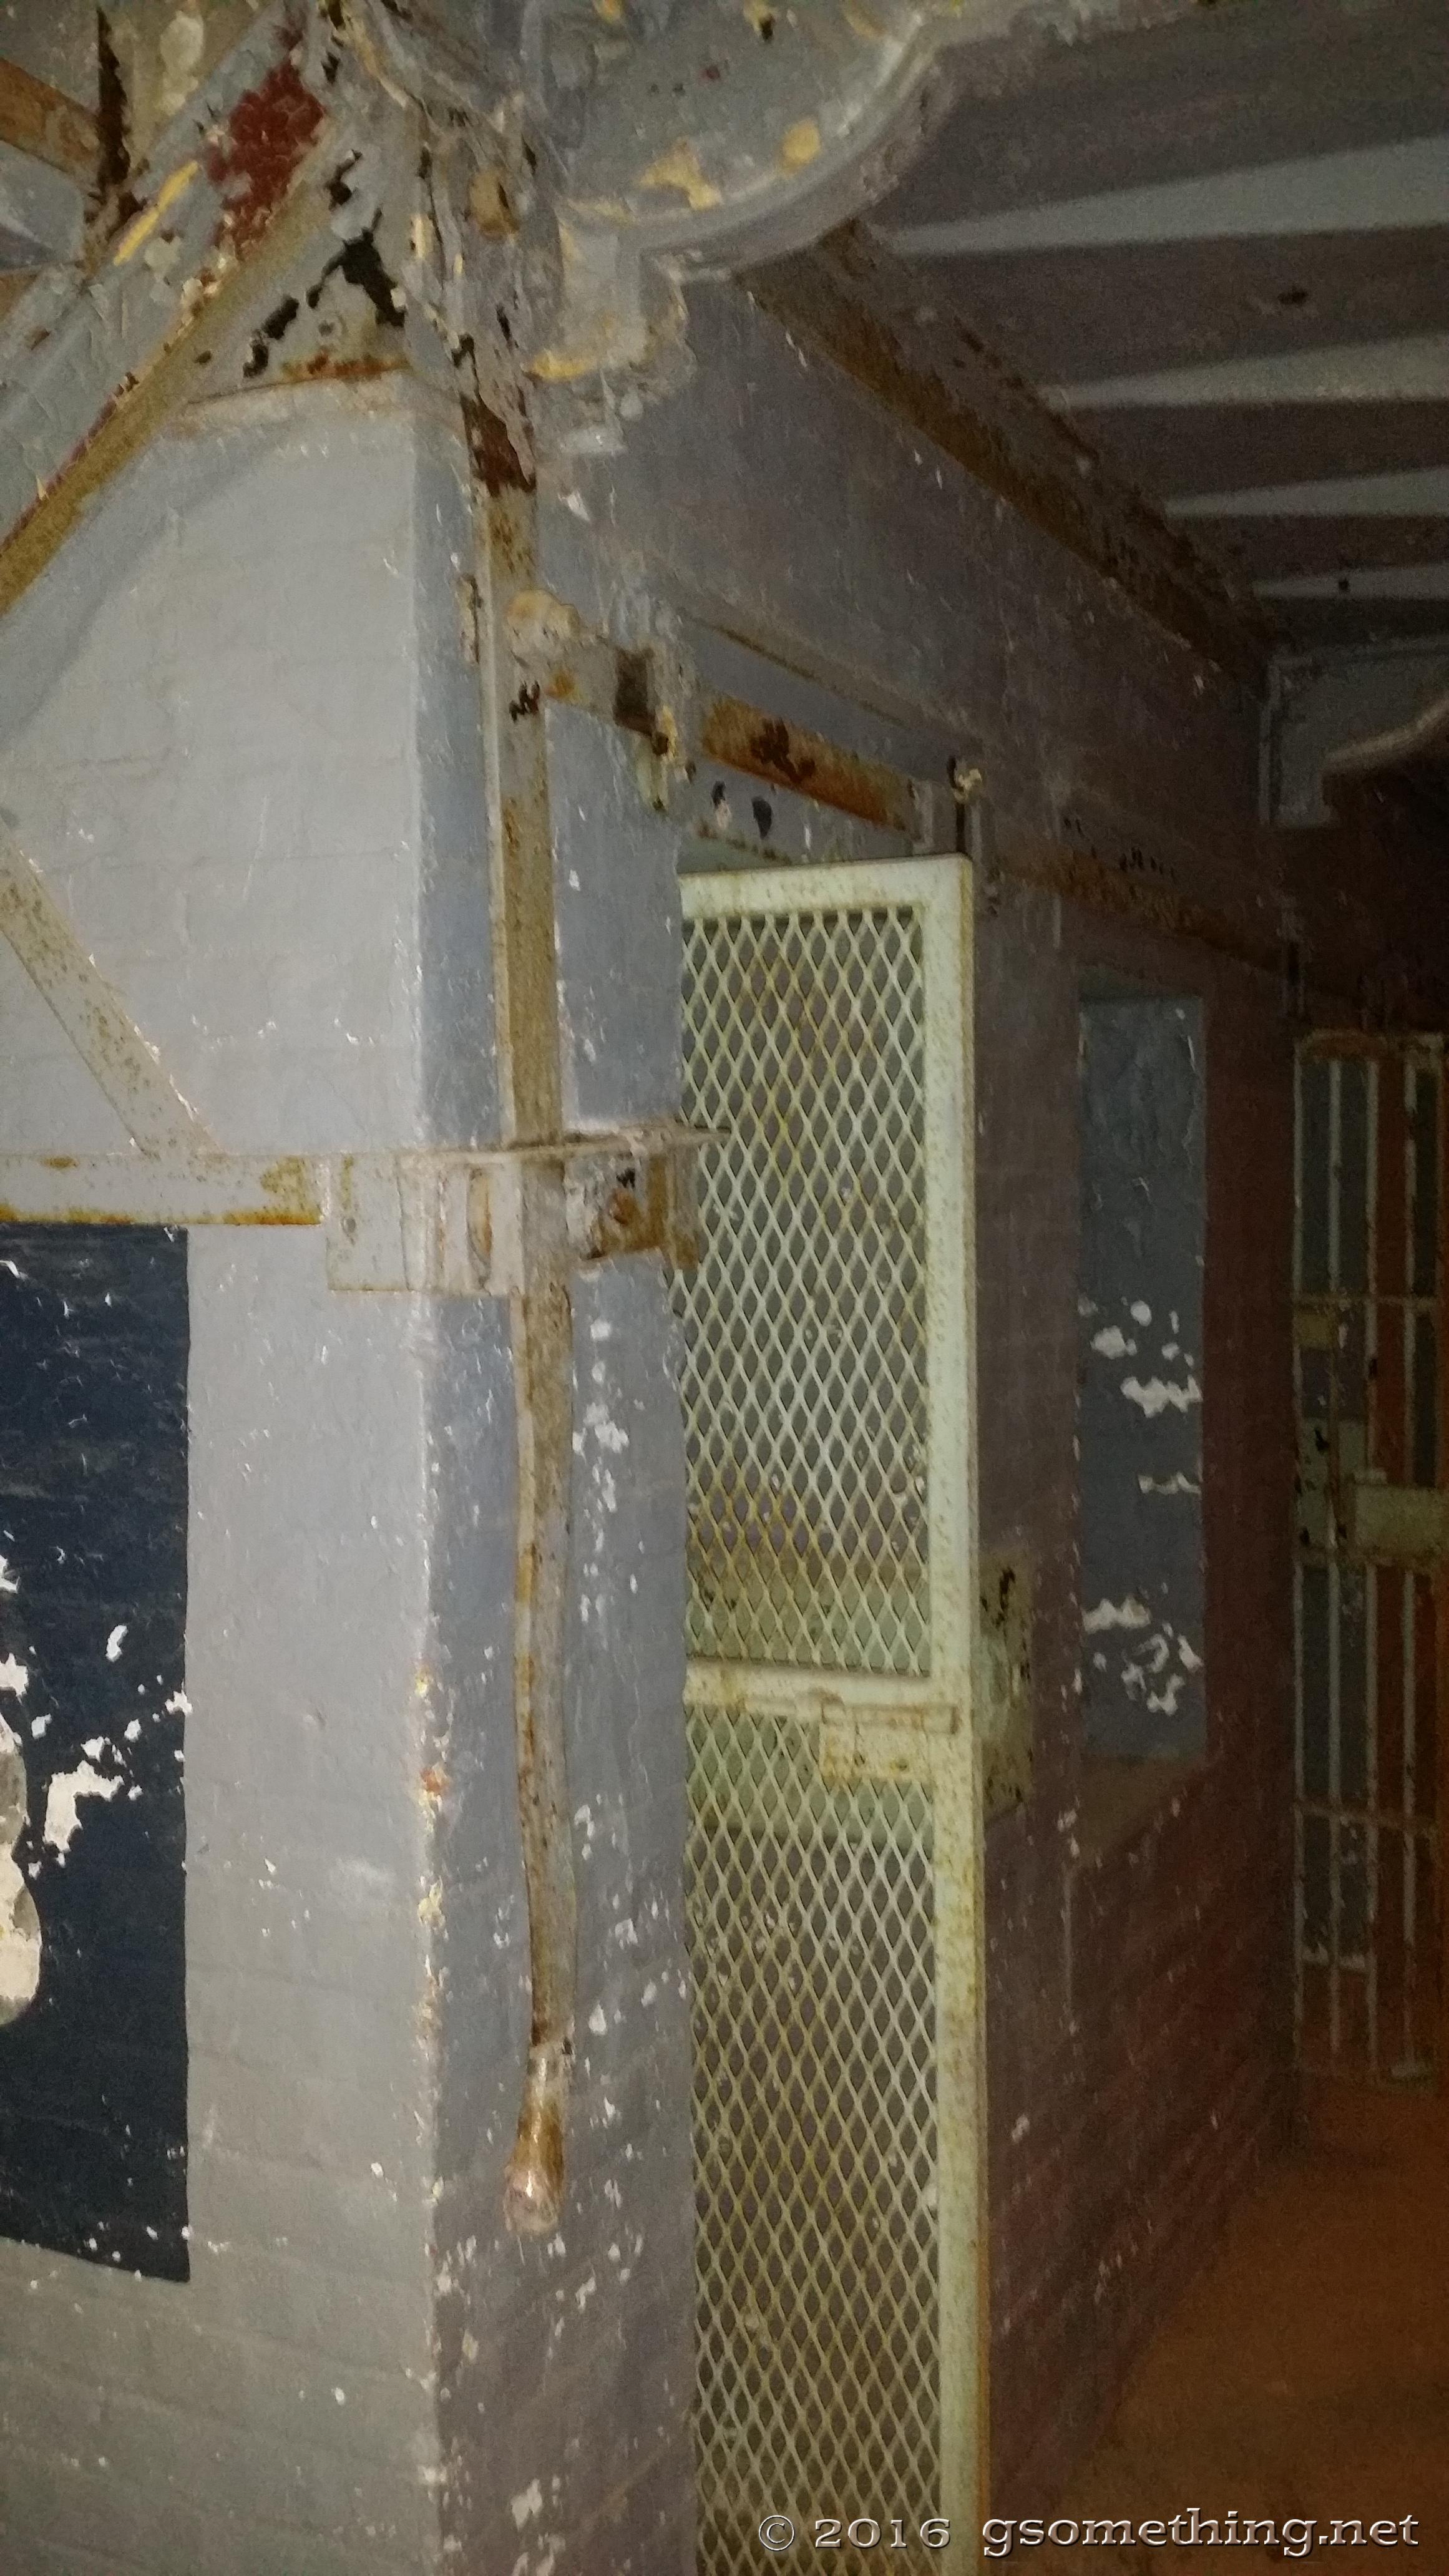 mansfield_reformatory_2nd_trip_73.jpg